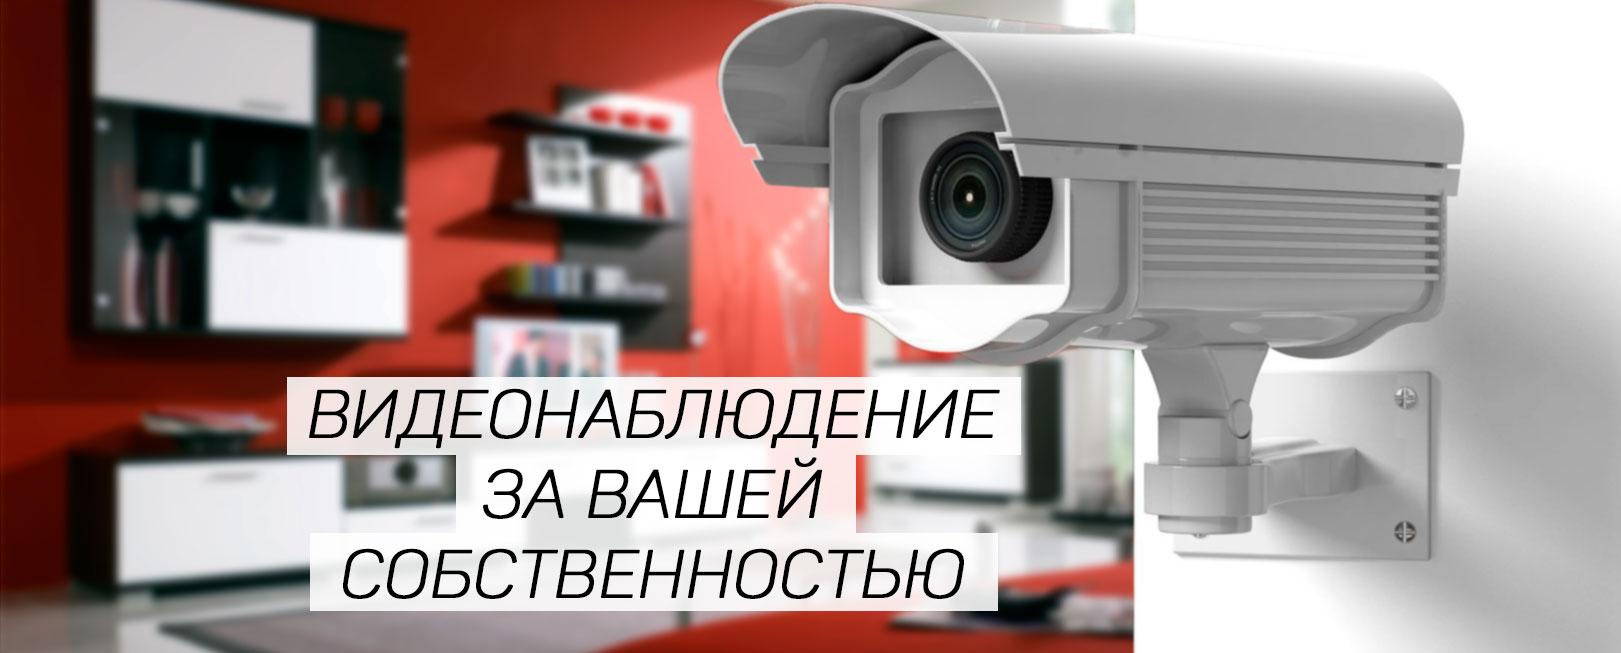 Доступ к web камере по ip